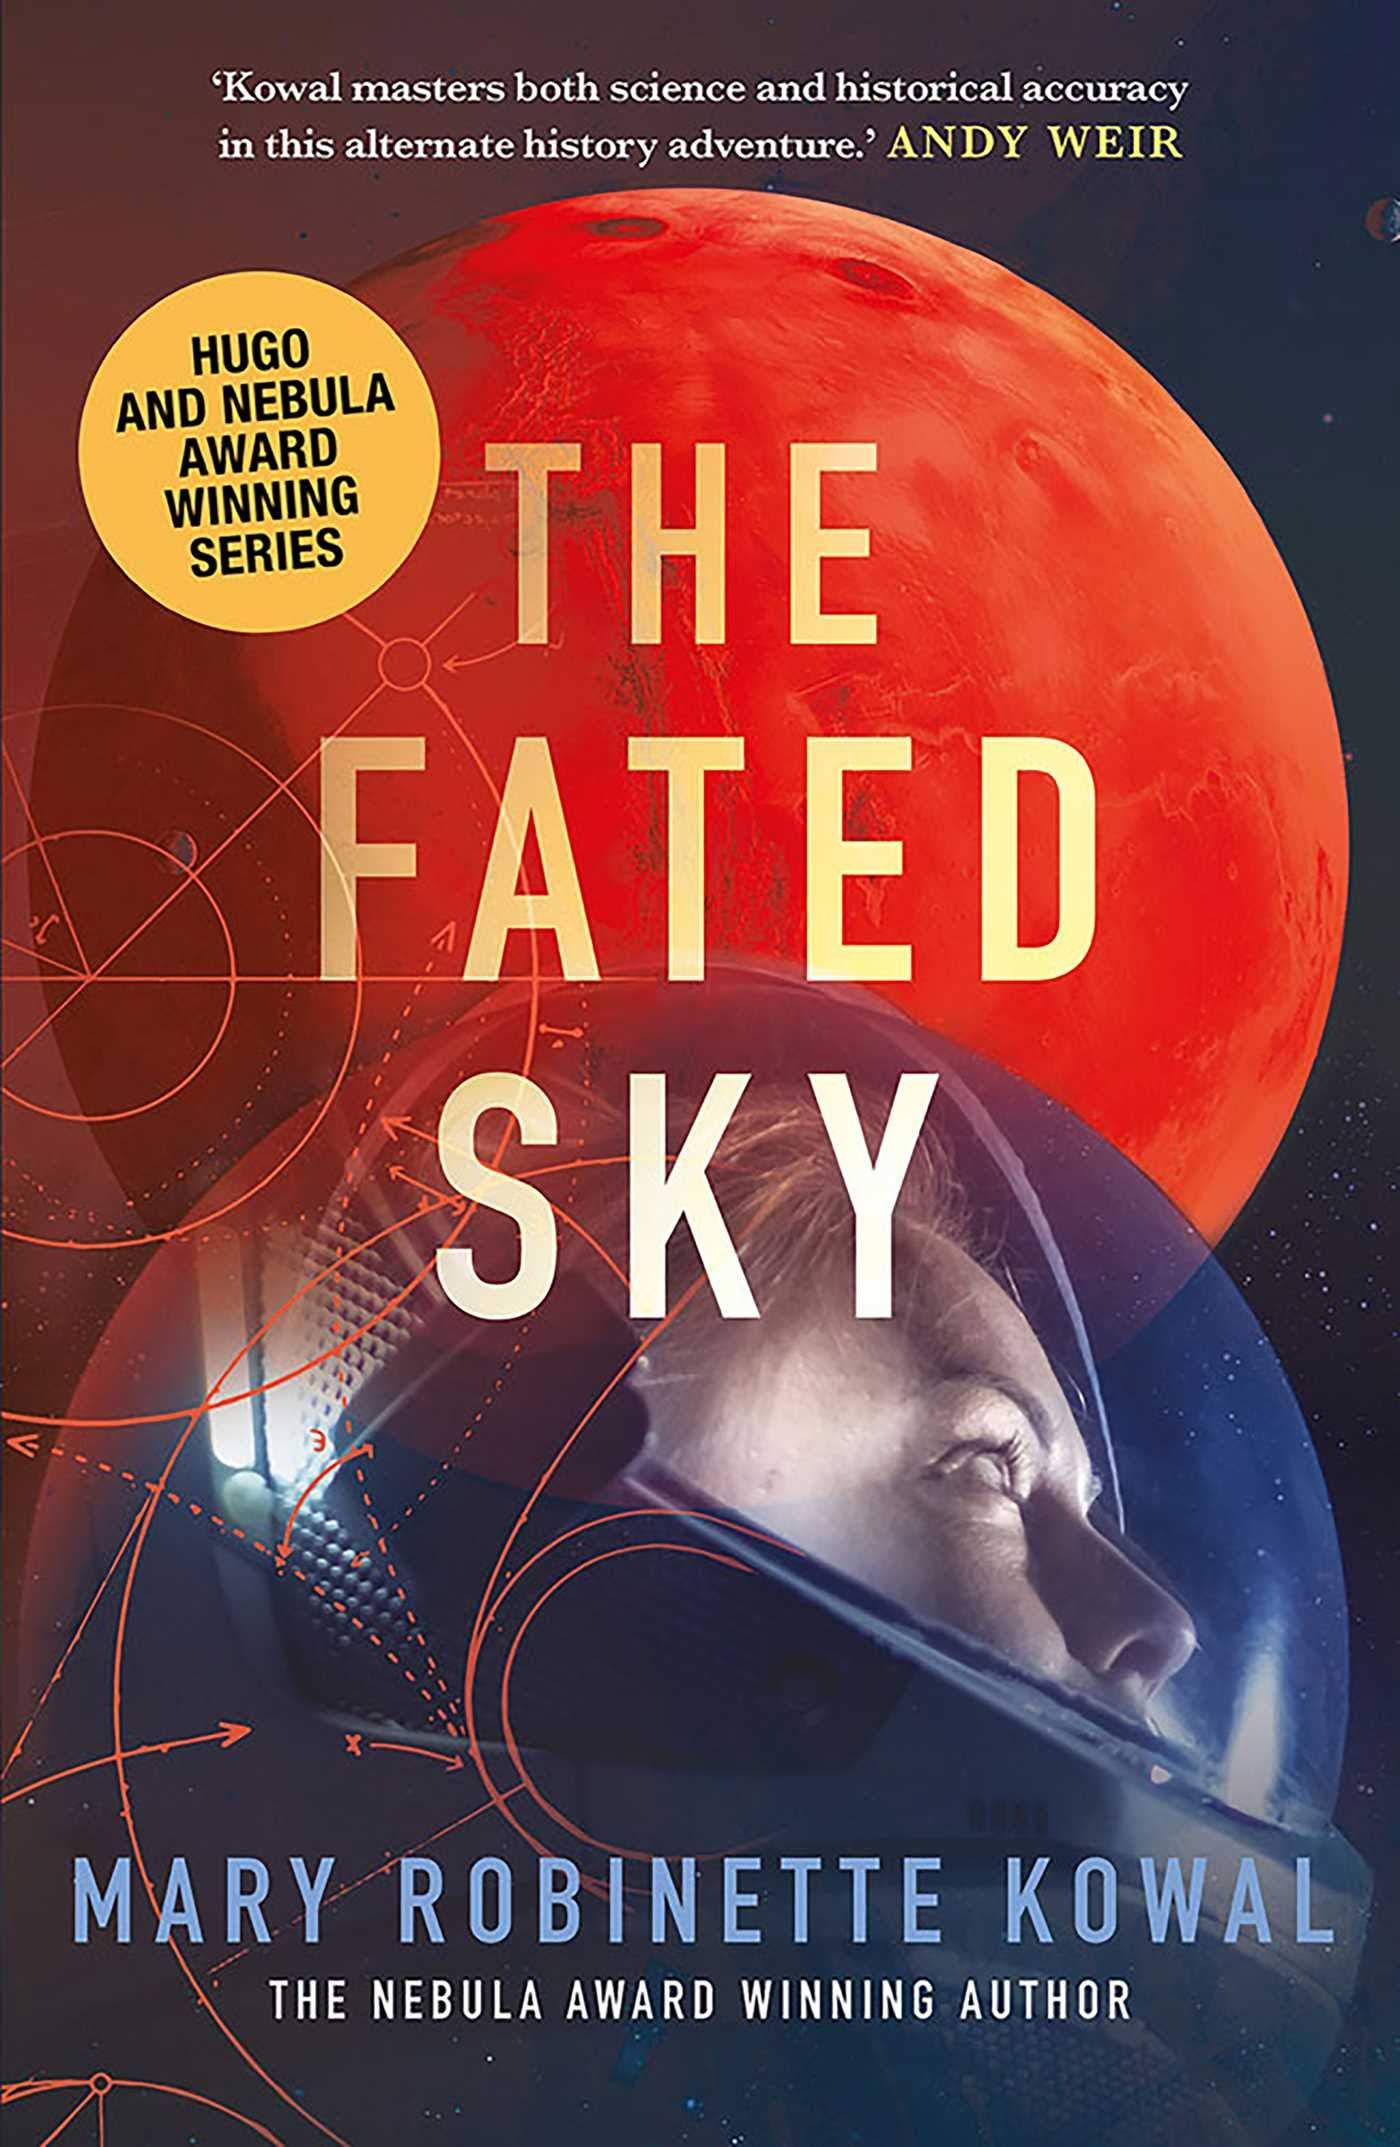 «The Fated Sky», de Mary Robinette Kowal